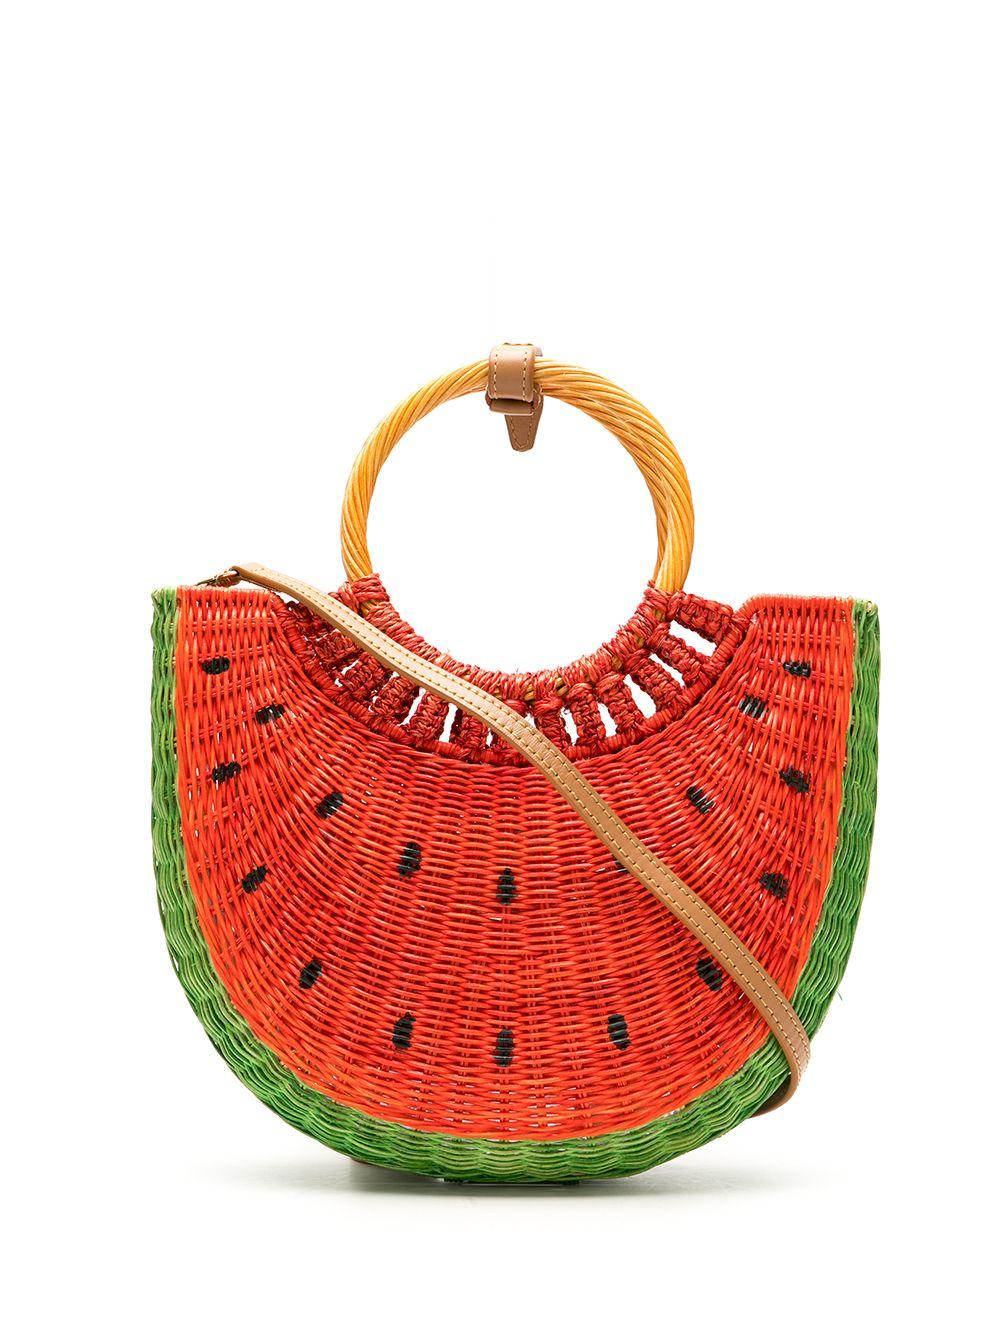 Watermelon Basket Tote Item # 10224